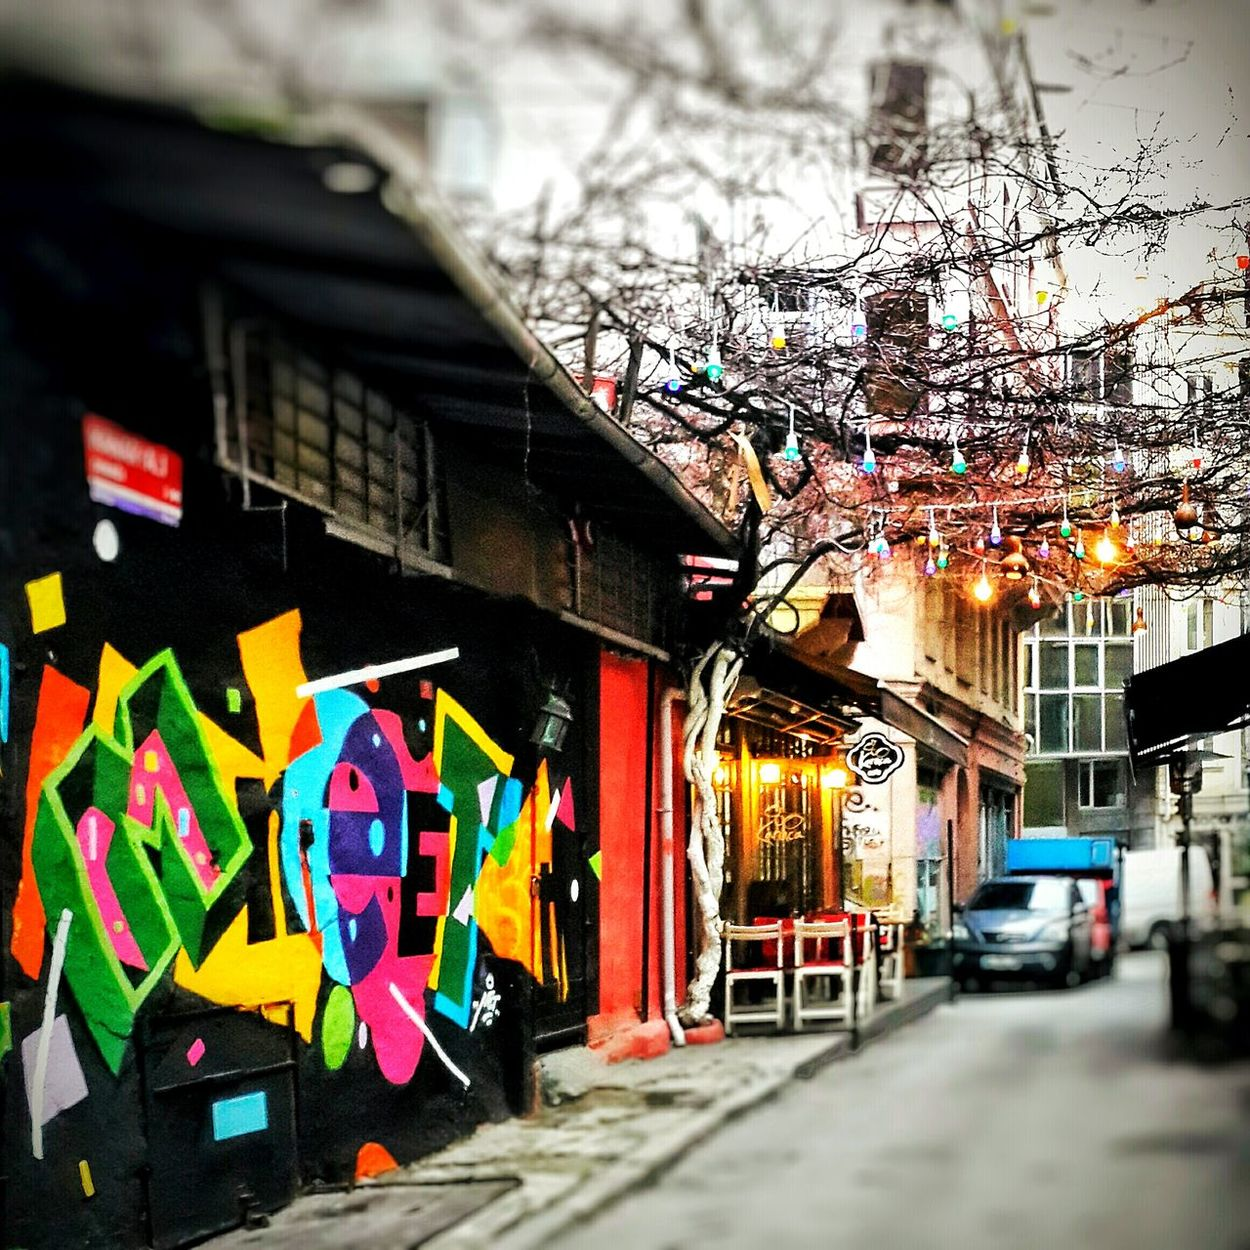 Karaköy Renklianlar Renklibinalar Renklirenkli Colors Colour Of Life Street Photography Streetphoto_color City 🎨colors 📷📷✌✌🌎🌎 Graffiti